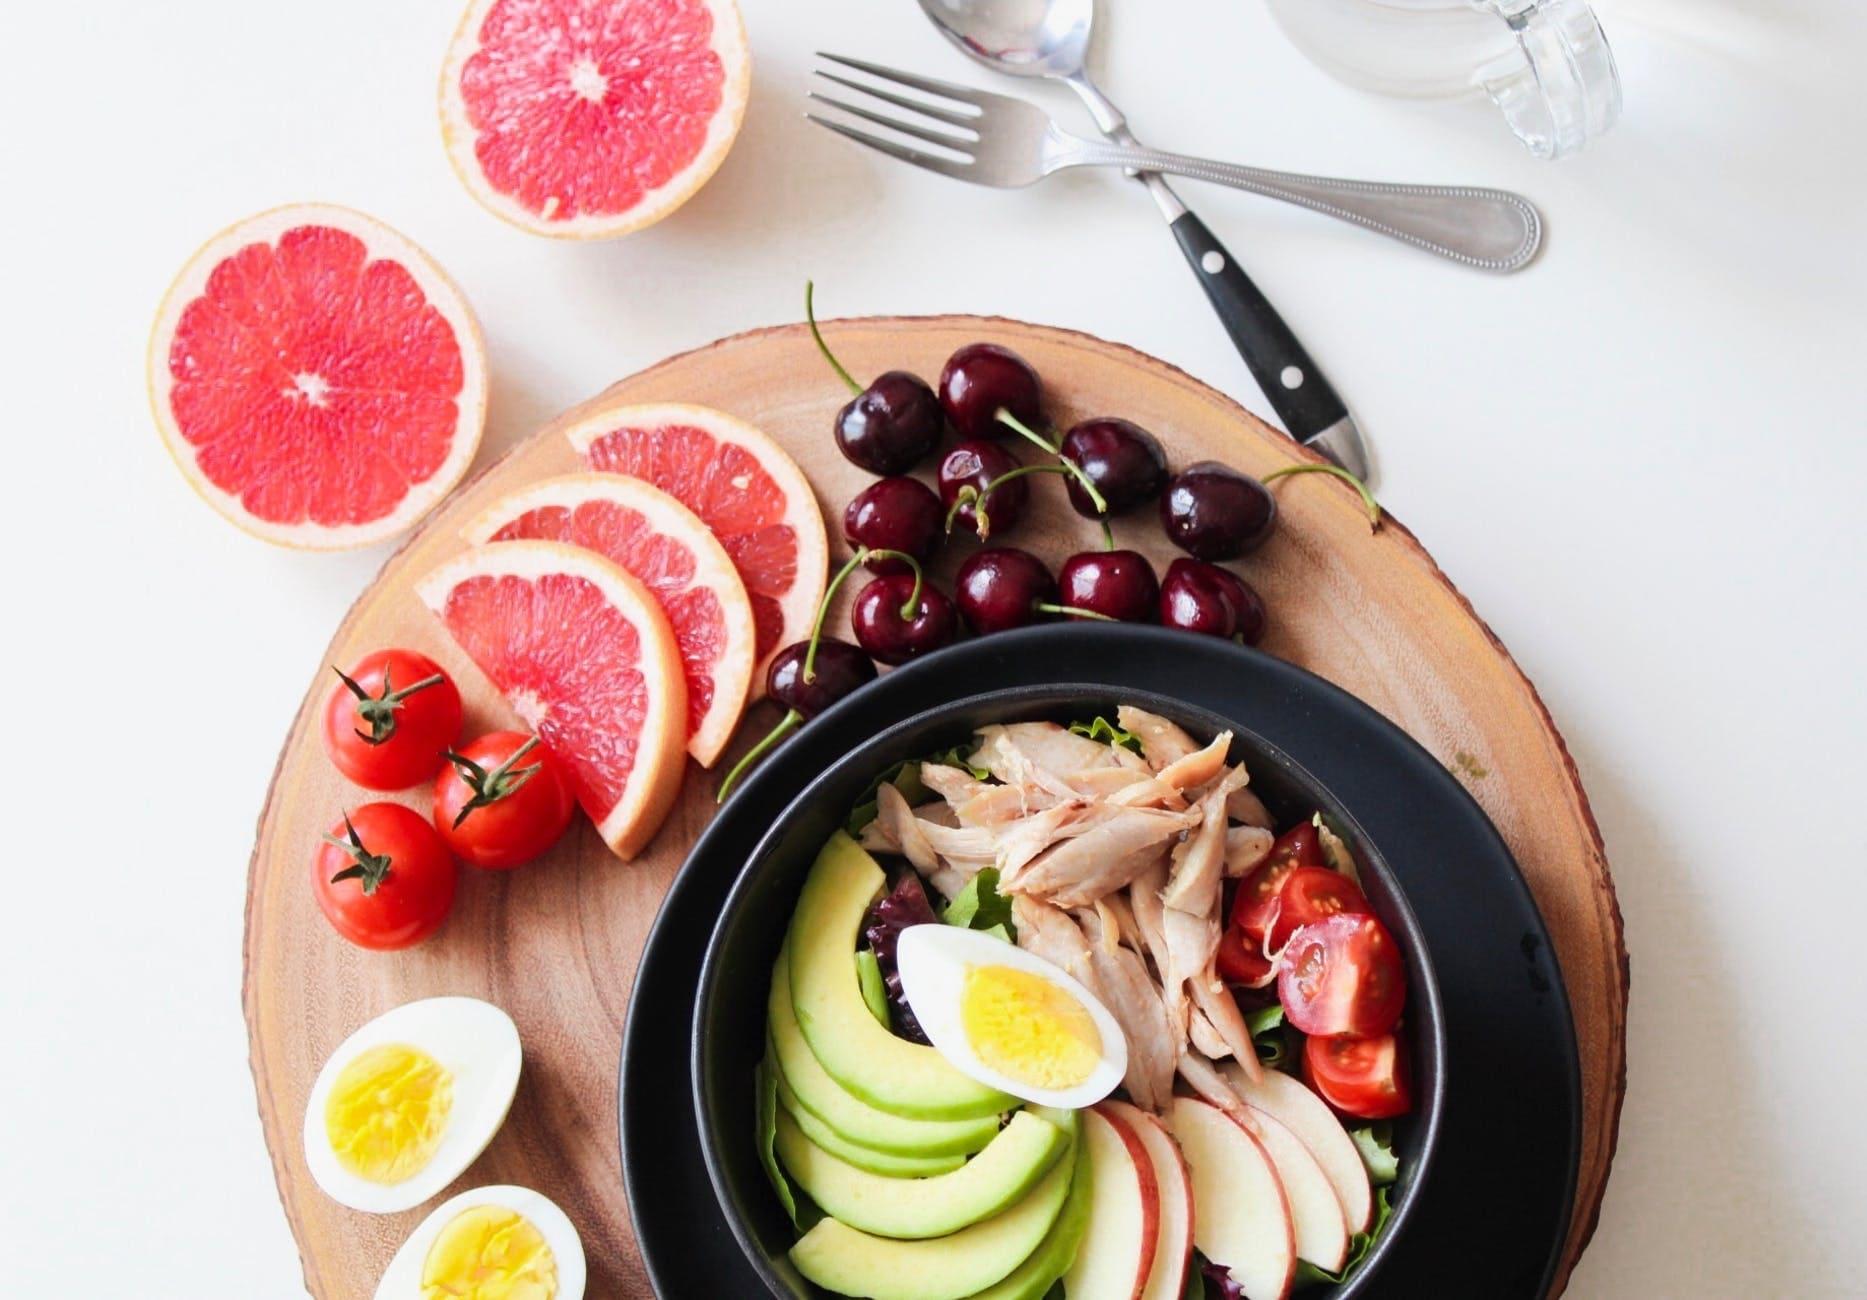 Vegetable salad with orange preparation method